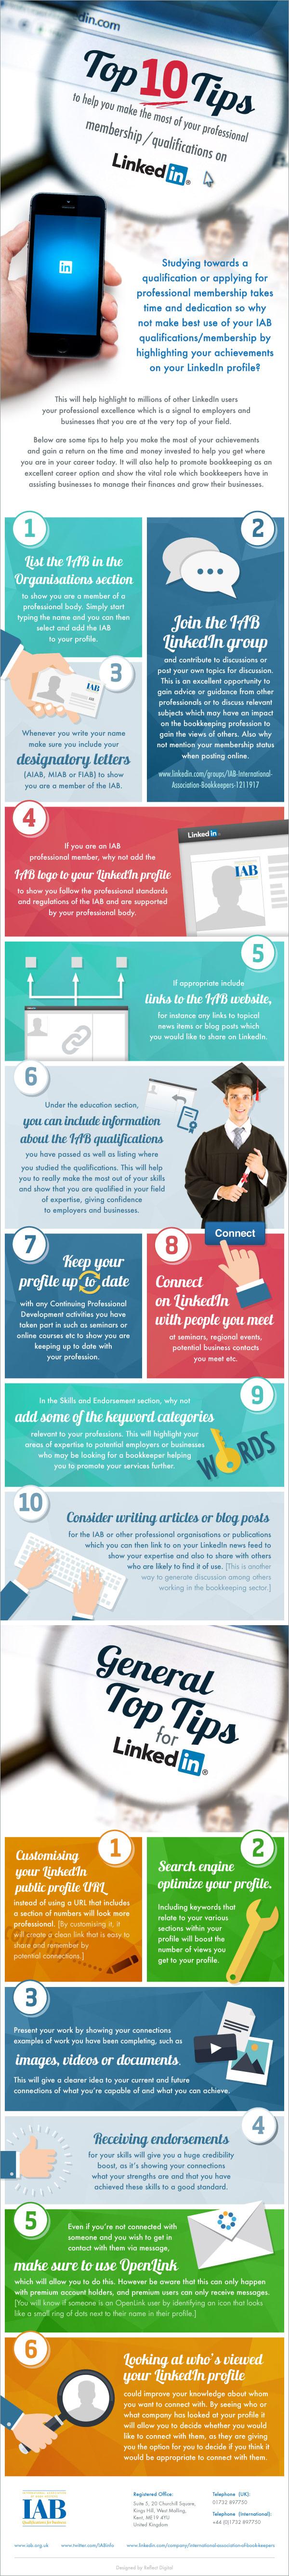 LinkedIn Tips infographic